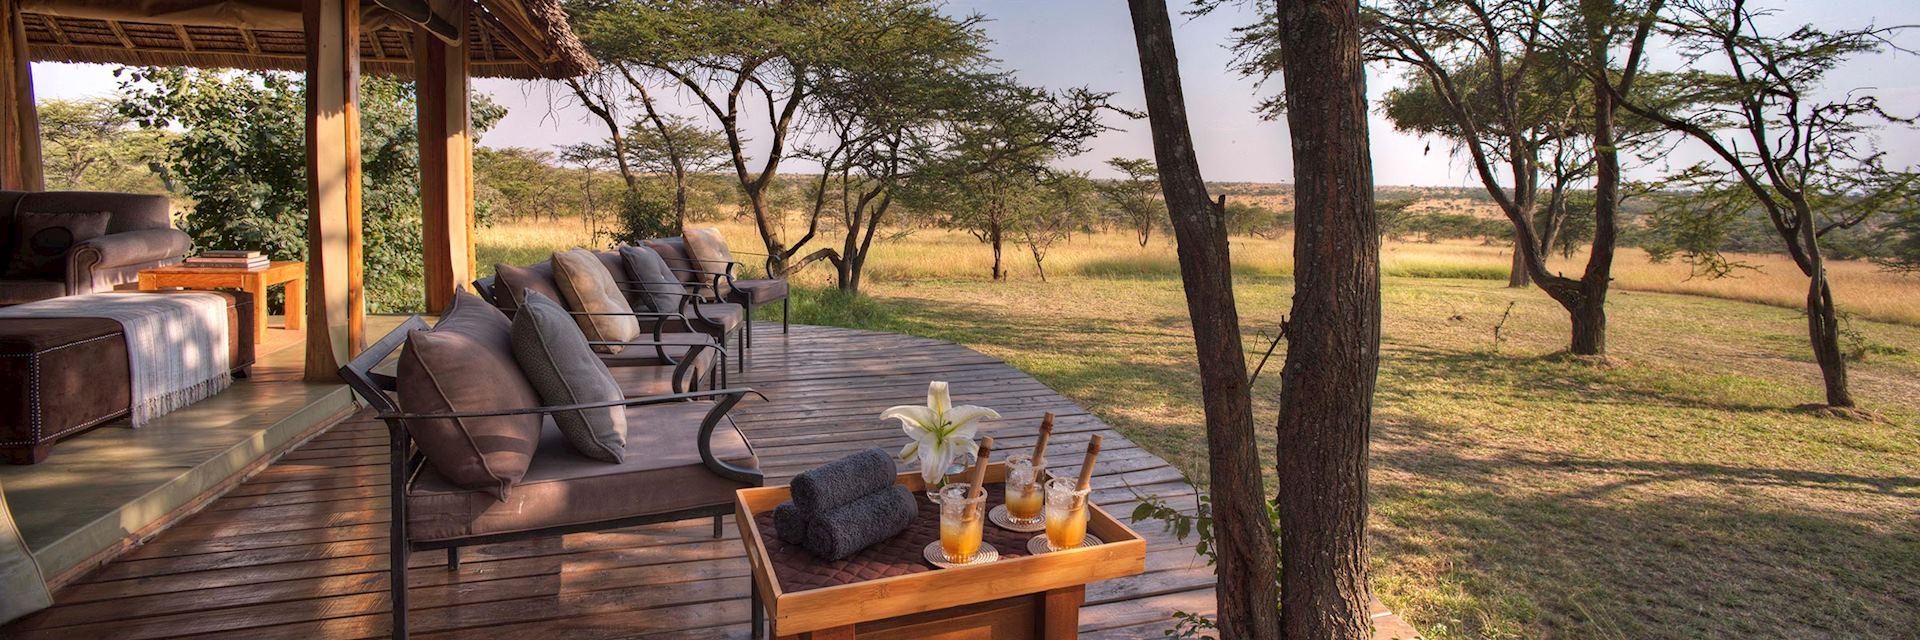 Asilia Naboisho Camp, Masai Mara National Reserve